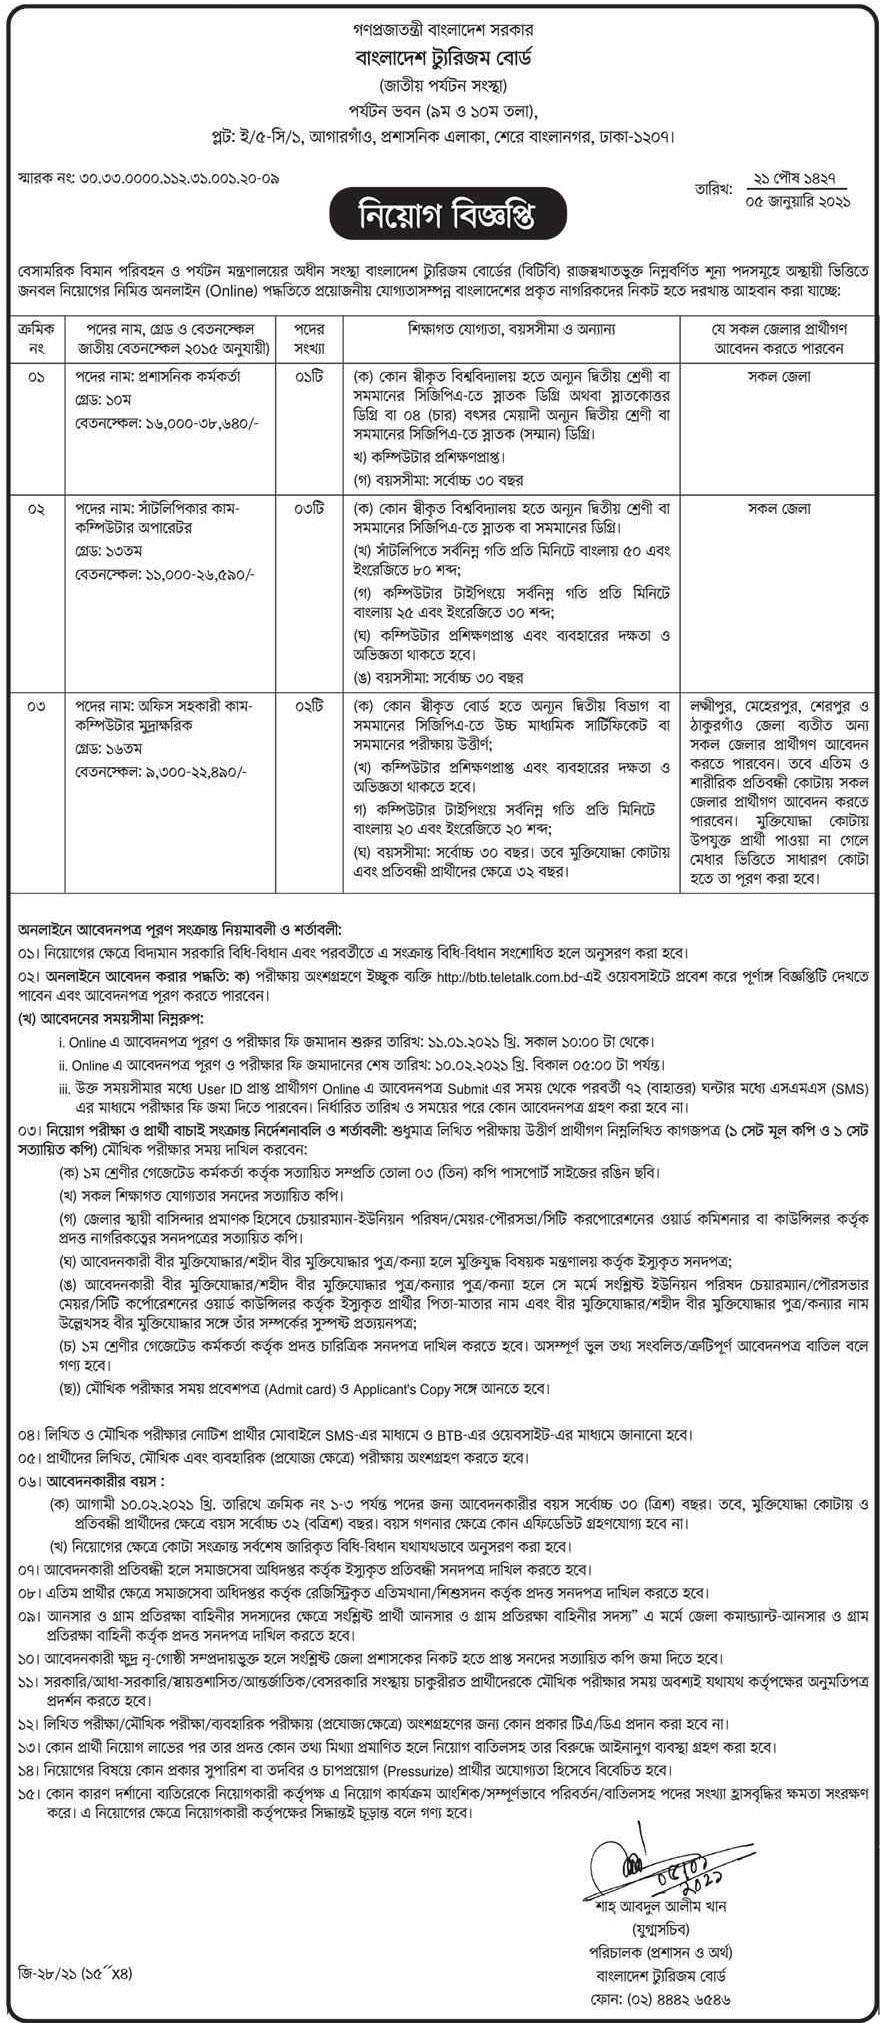 Bangladesh Tourism Board (BTB) Job Circular February 2021